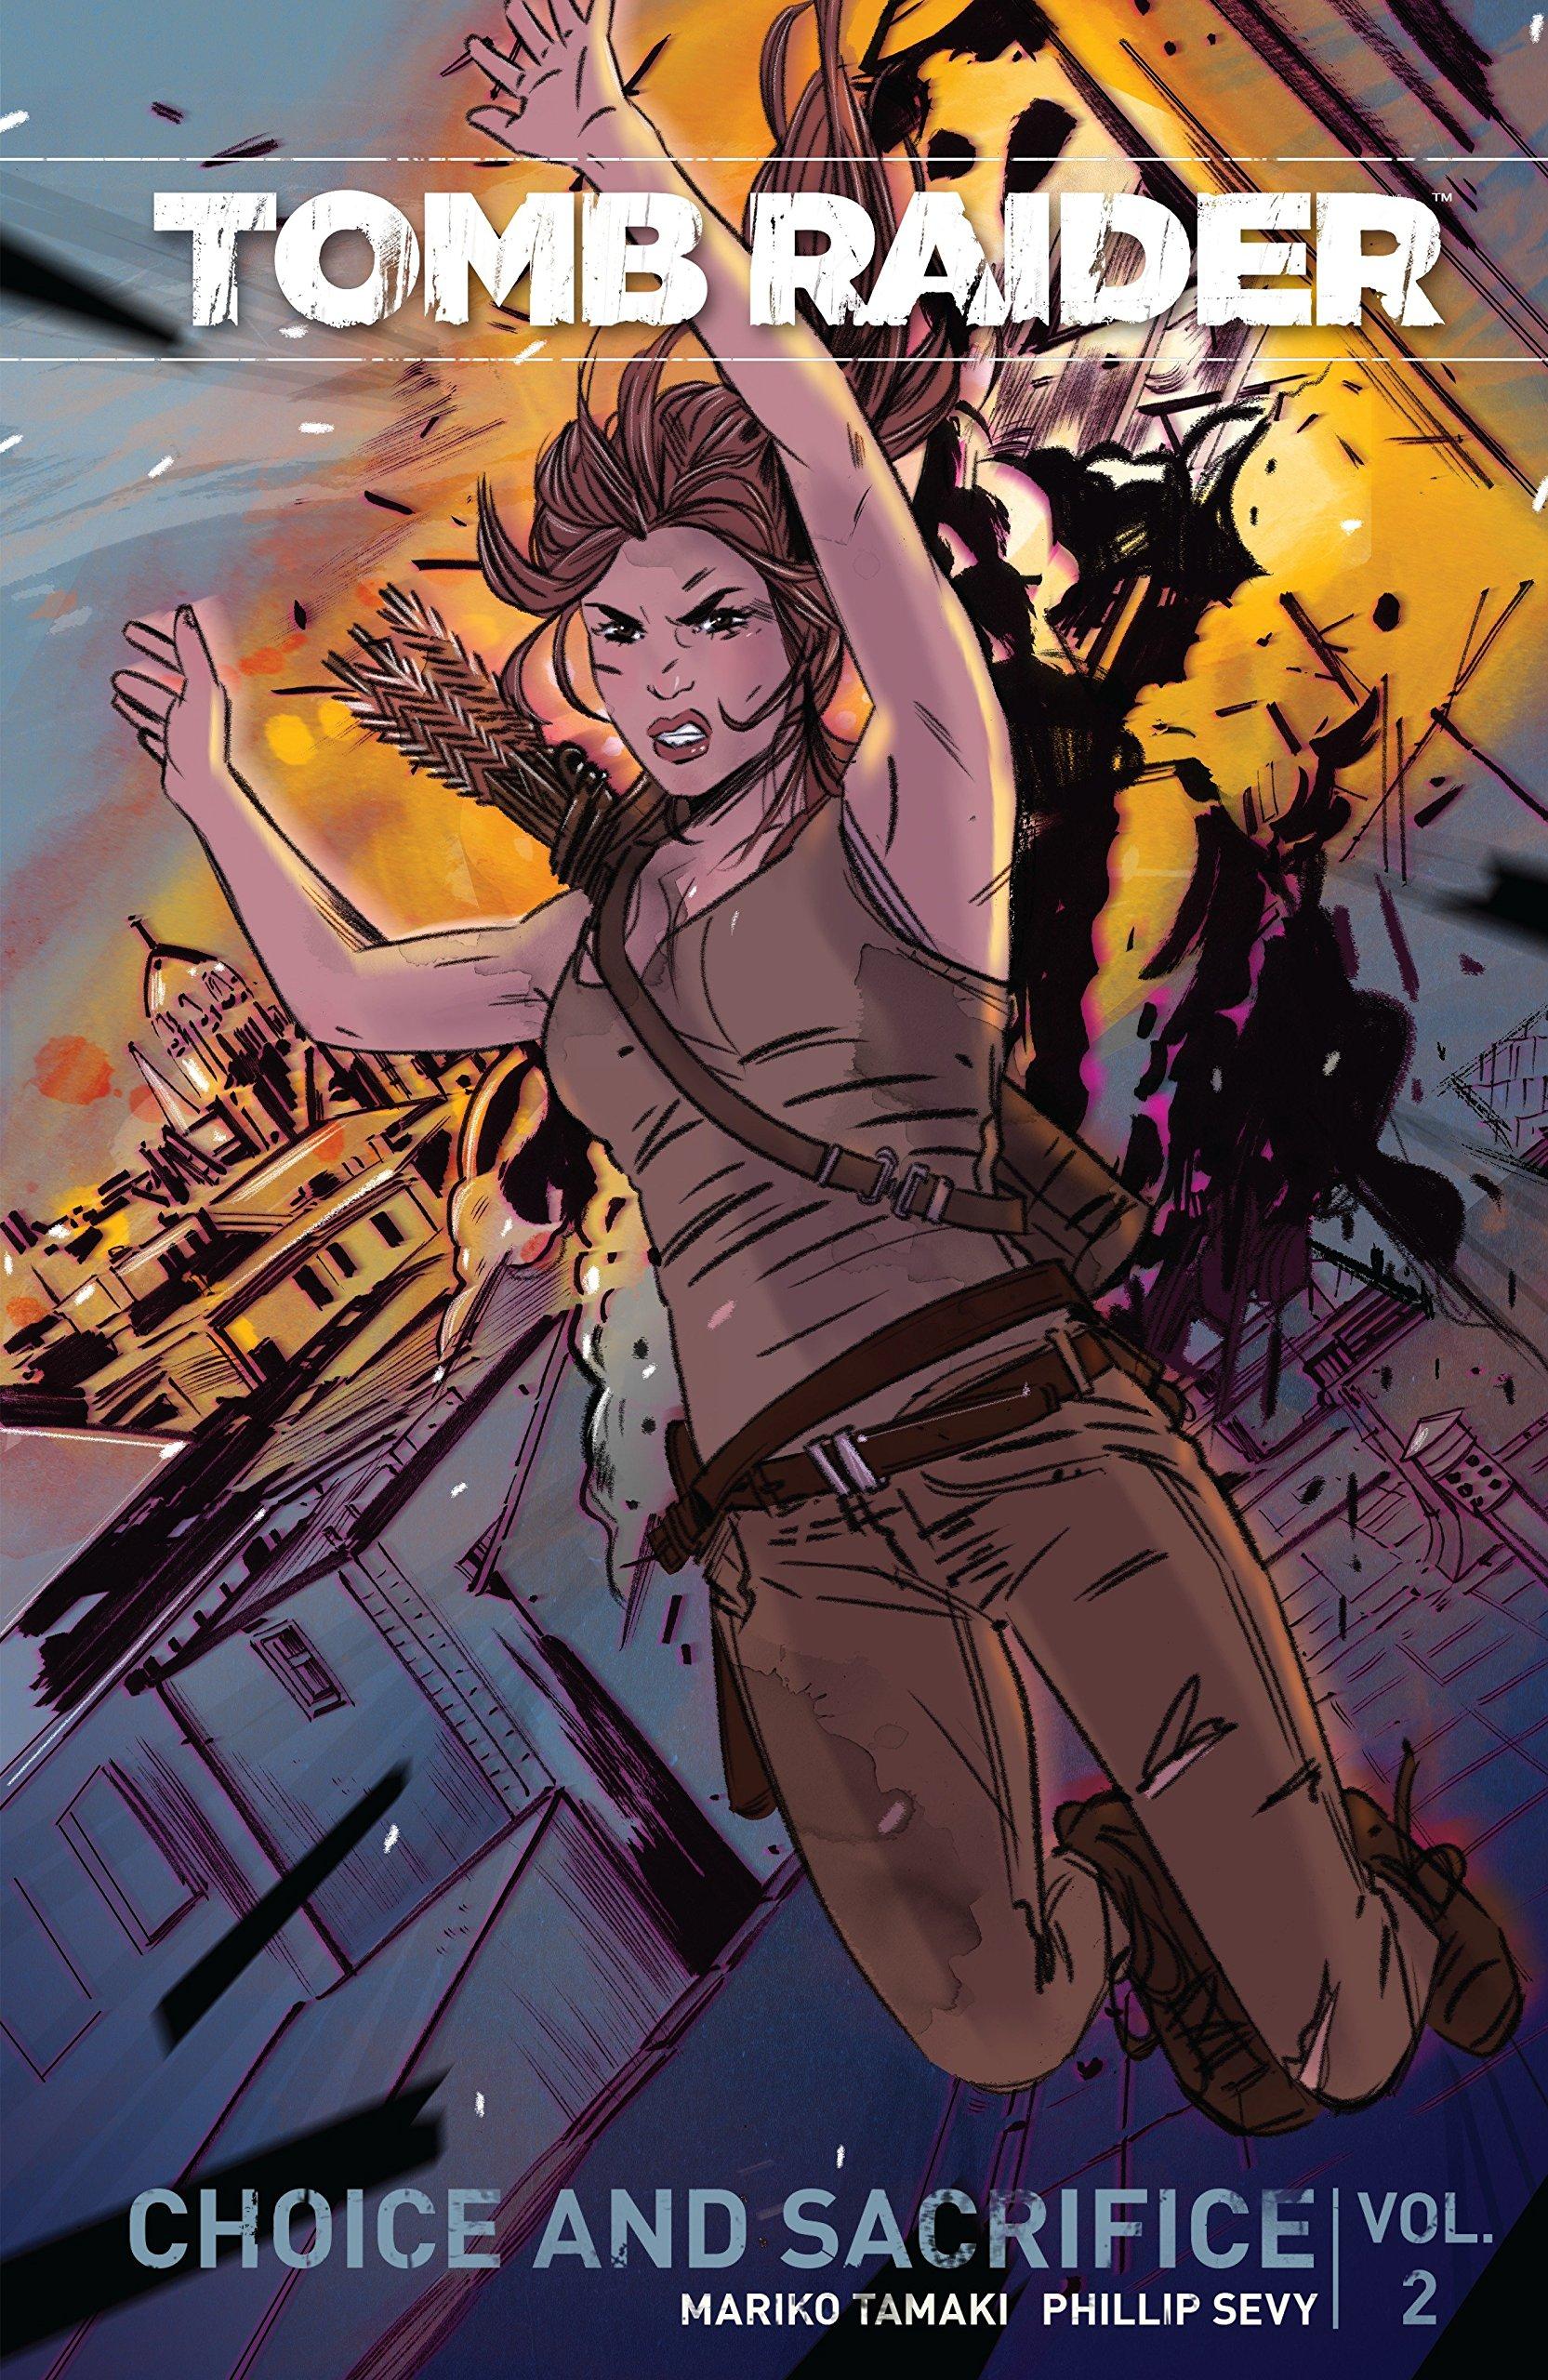 Tomb Raider Volume 2 Choice and Sacrifice: Amazon.co.uk: Maiko Tamaki,  Phillip Sevy, Tula Lotay, Michael Atiyeh: 9781506701622: Books